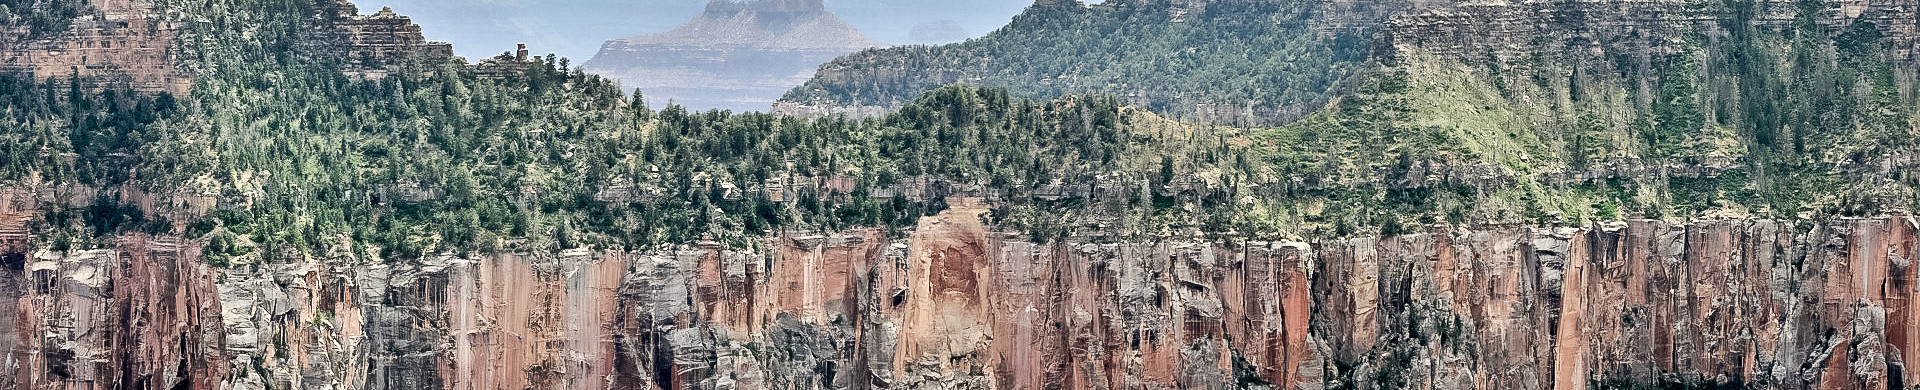 Grand Canyon: Roaring Springs Canyon